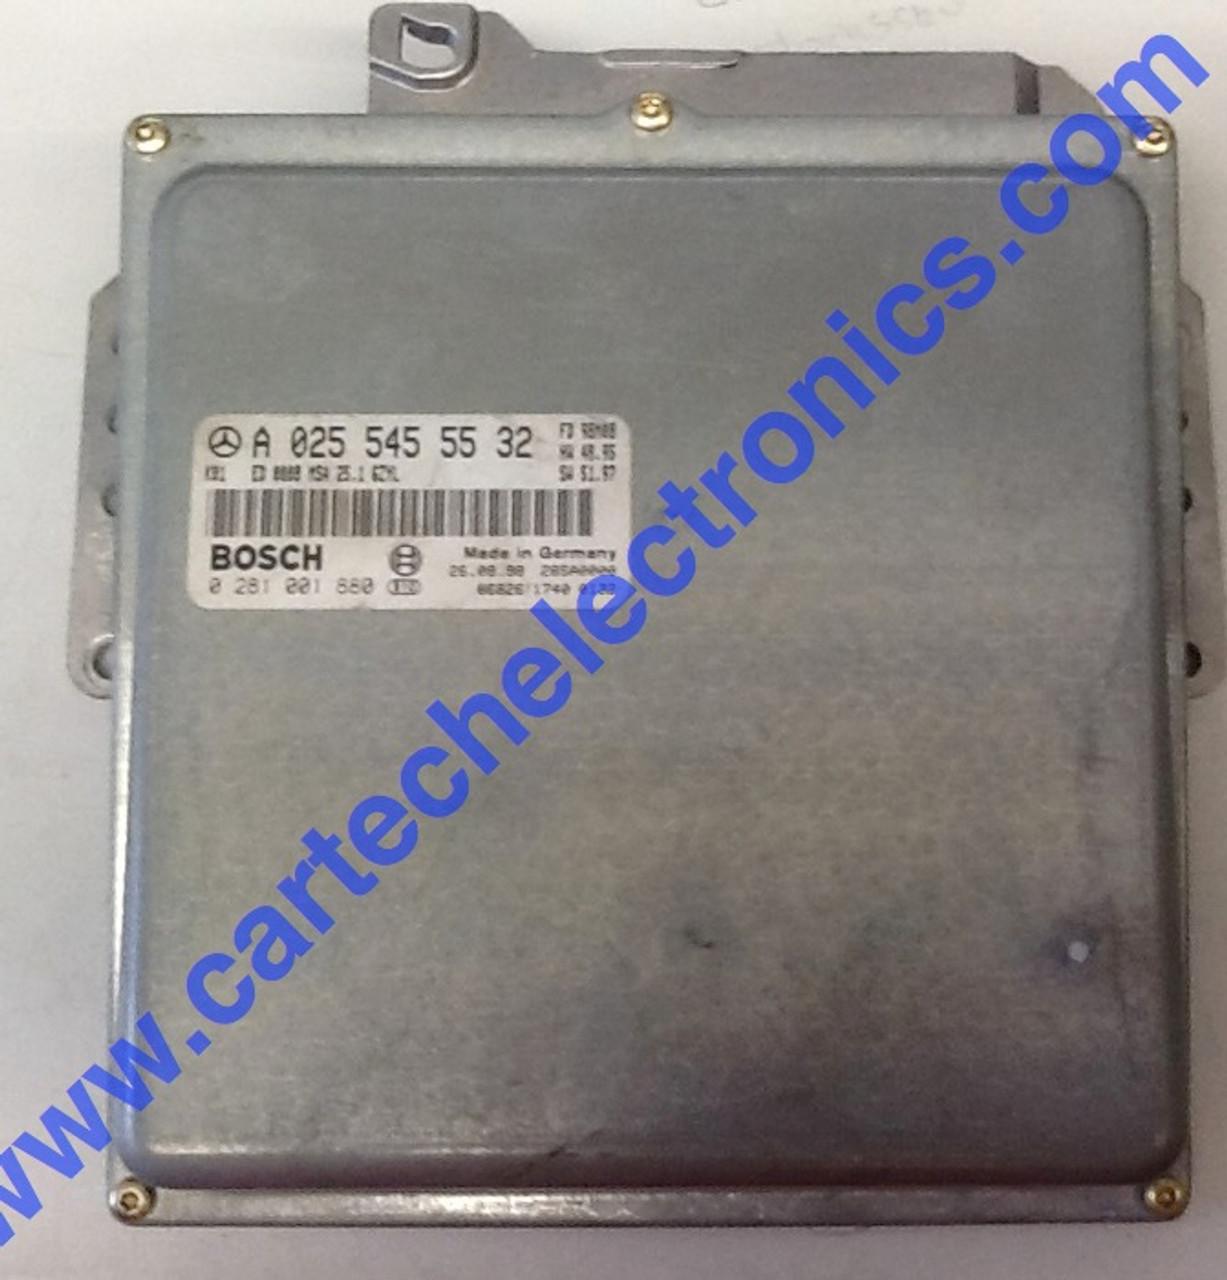 Plug & Play Mercedes Engine ECU 0281001880 A0255455532 MSA 25.1